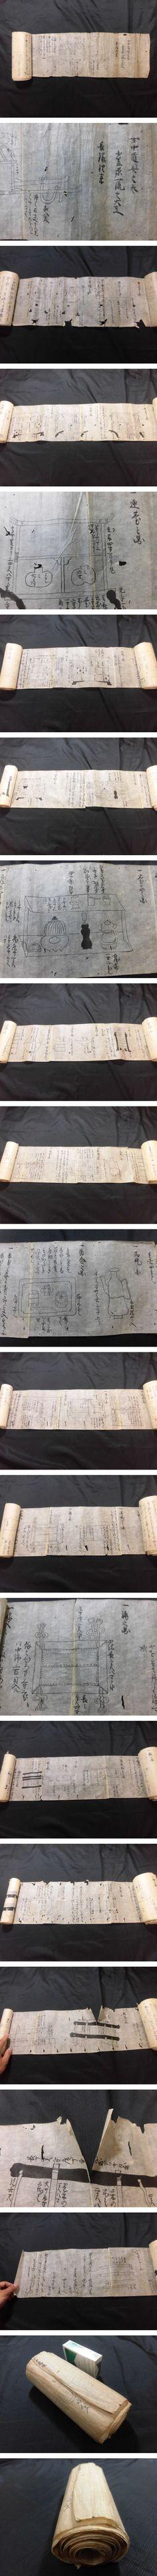 720cm◆江戸期 肉筆絵入 巻物【女中道具之巻 ... - ヤフオク!